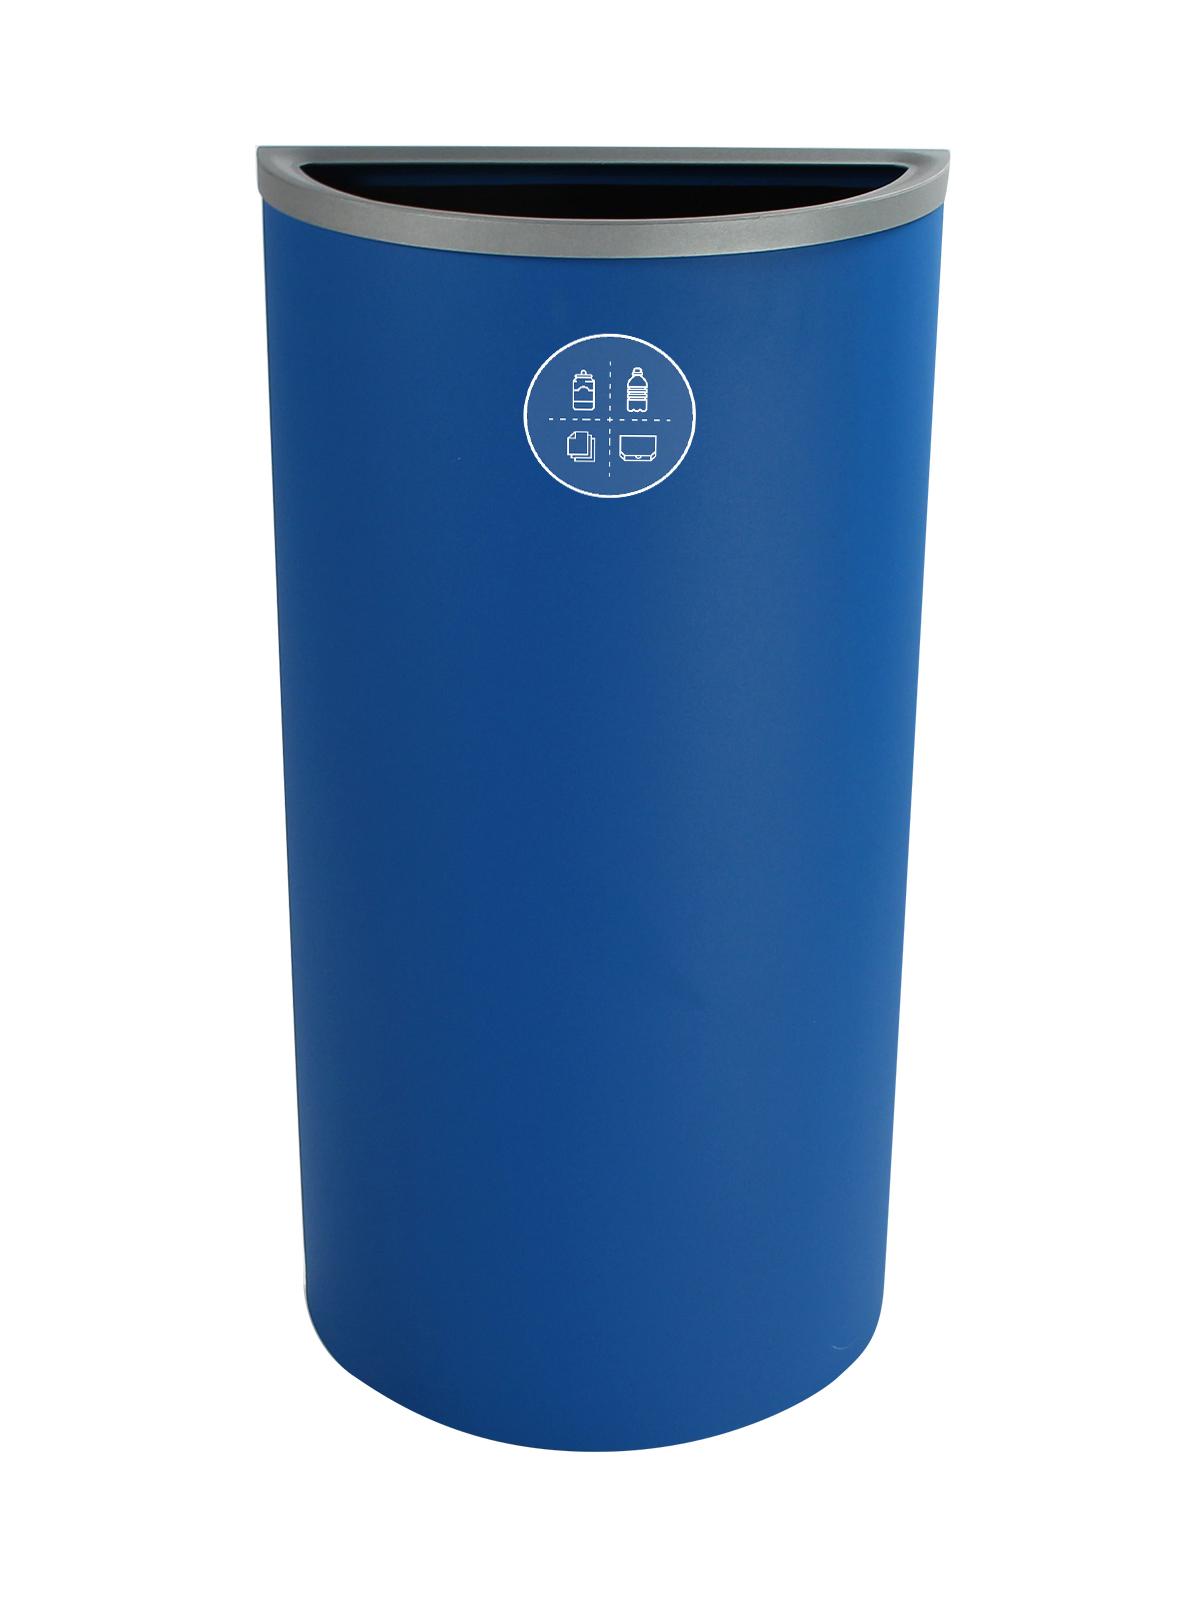 SPECTRUM - Single - Ellipse Slim - Mixed Recyclables - Full - Blue